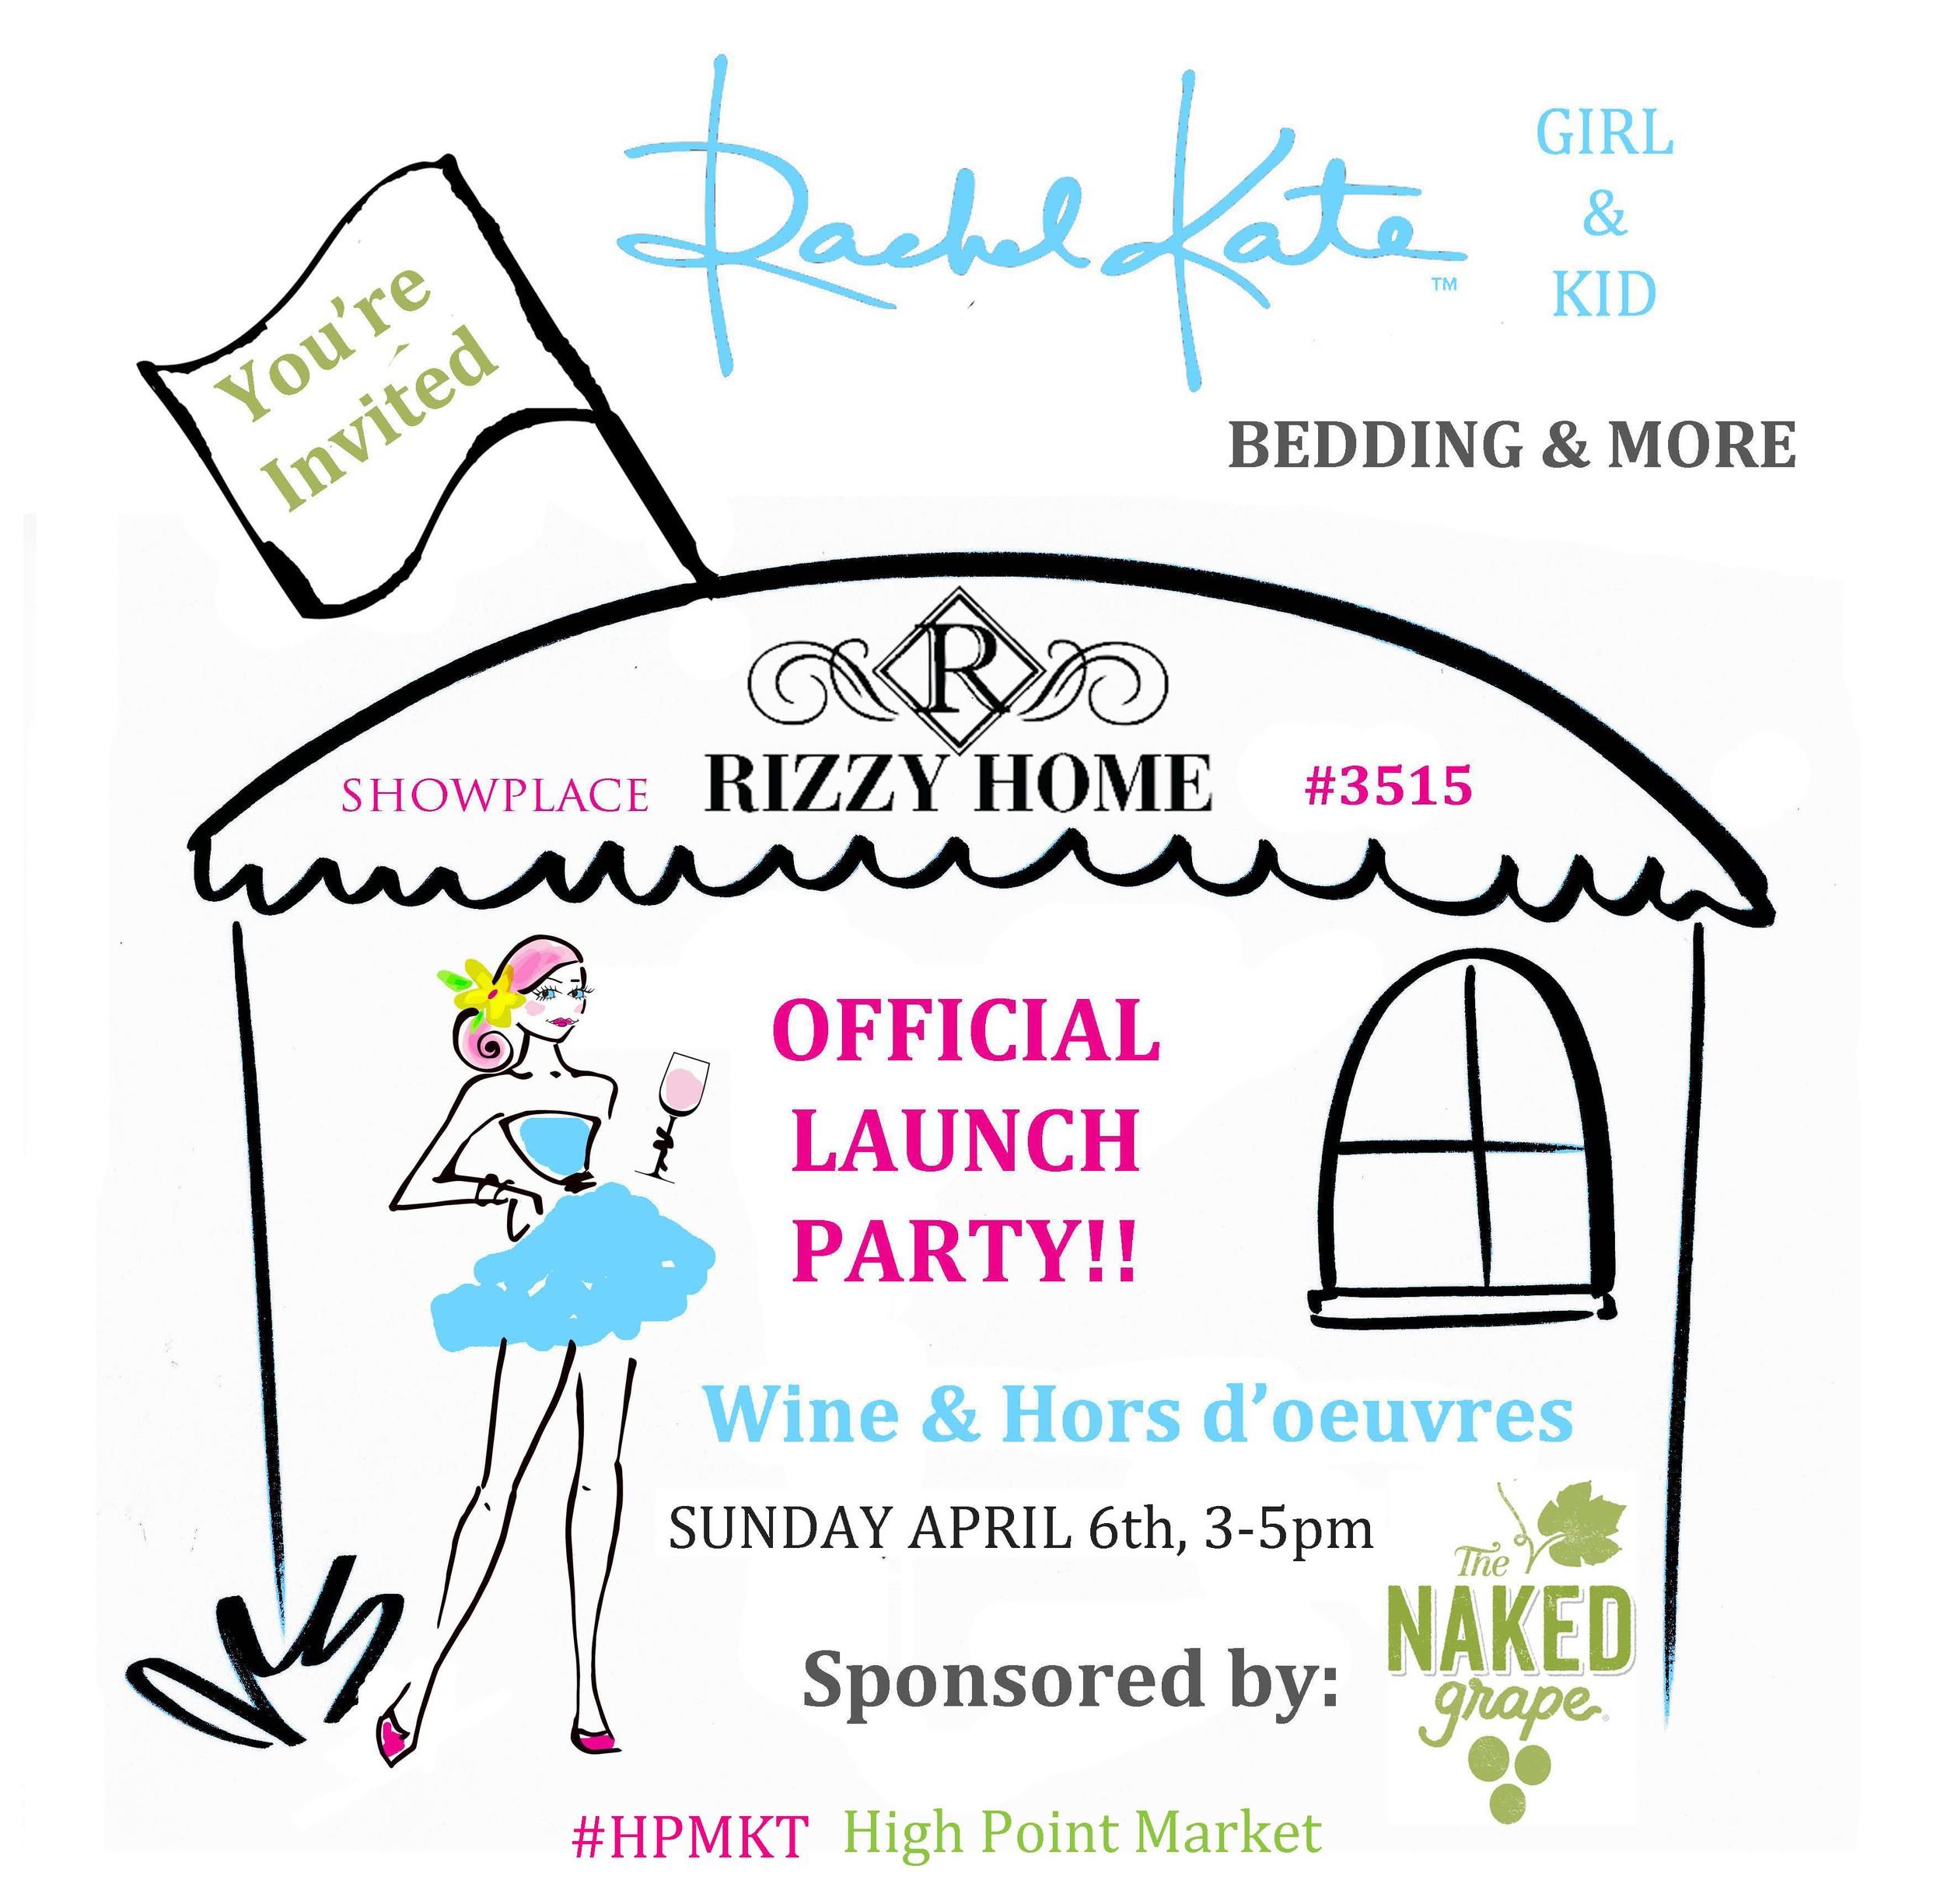 Rachel Kate Beddig Launch